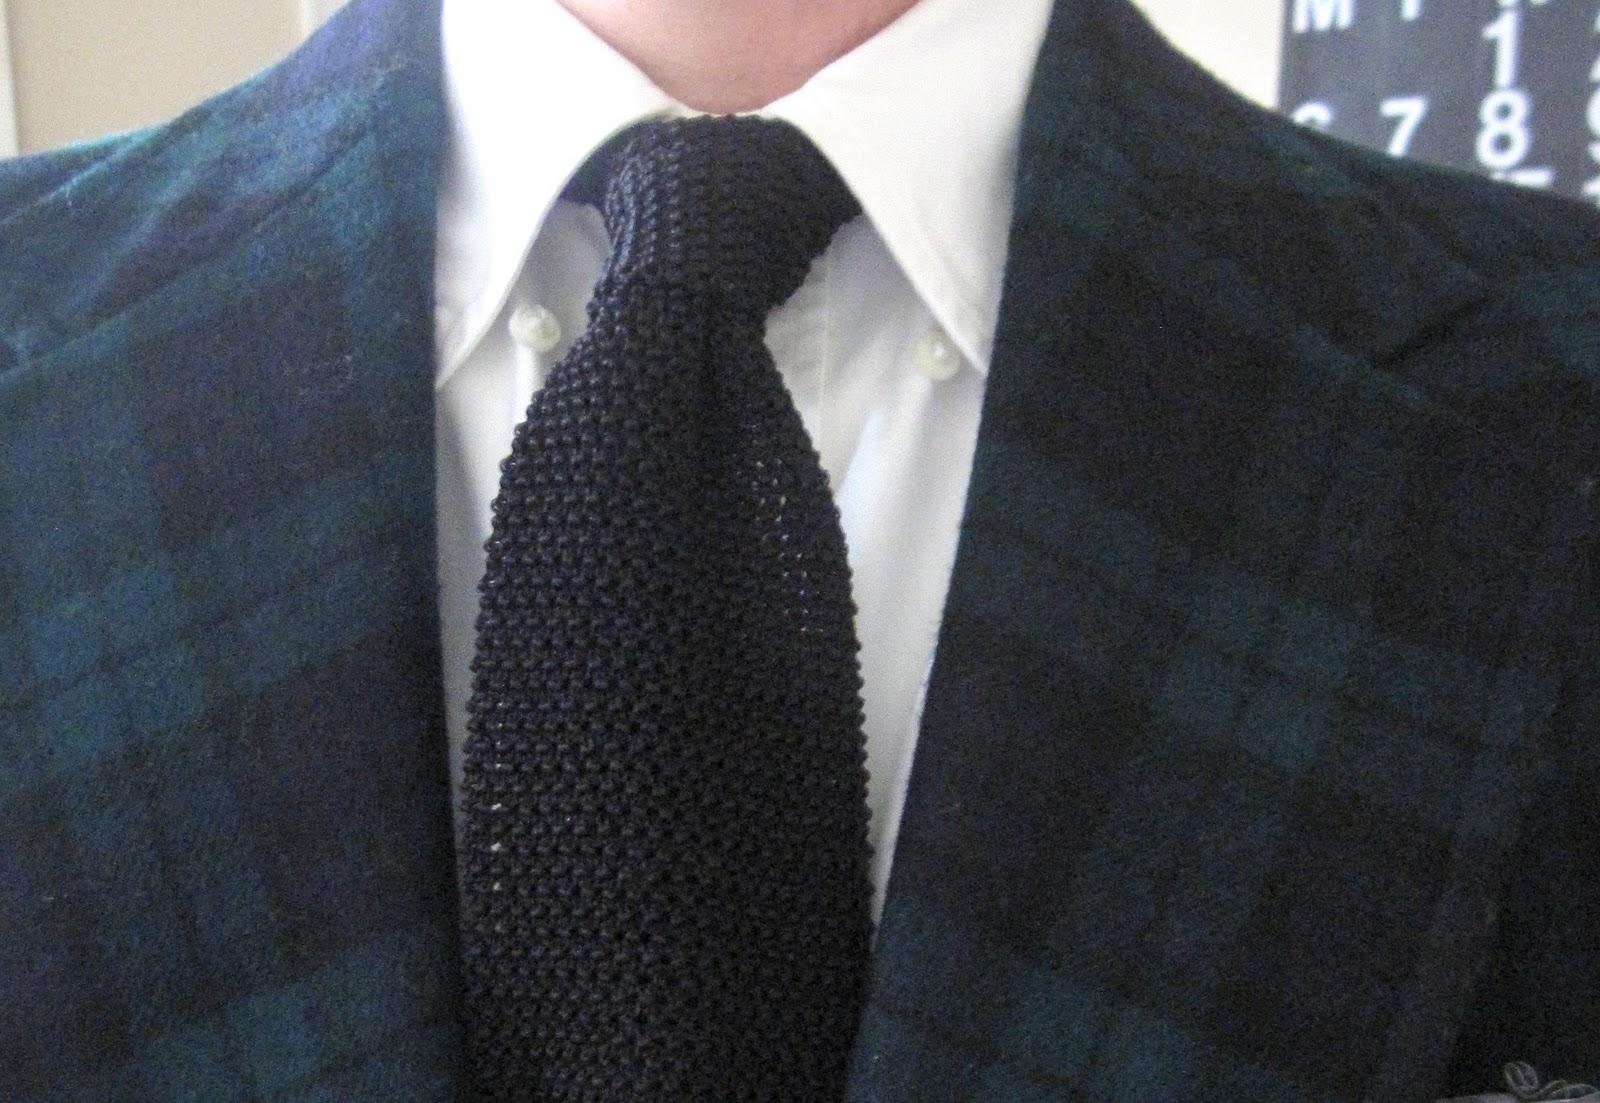 black knit tie photo - 1